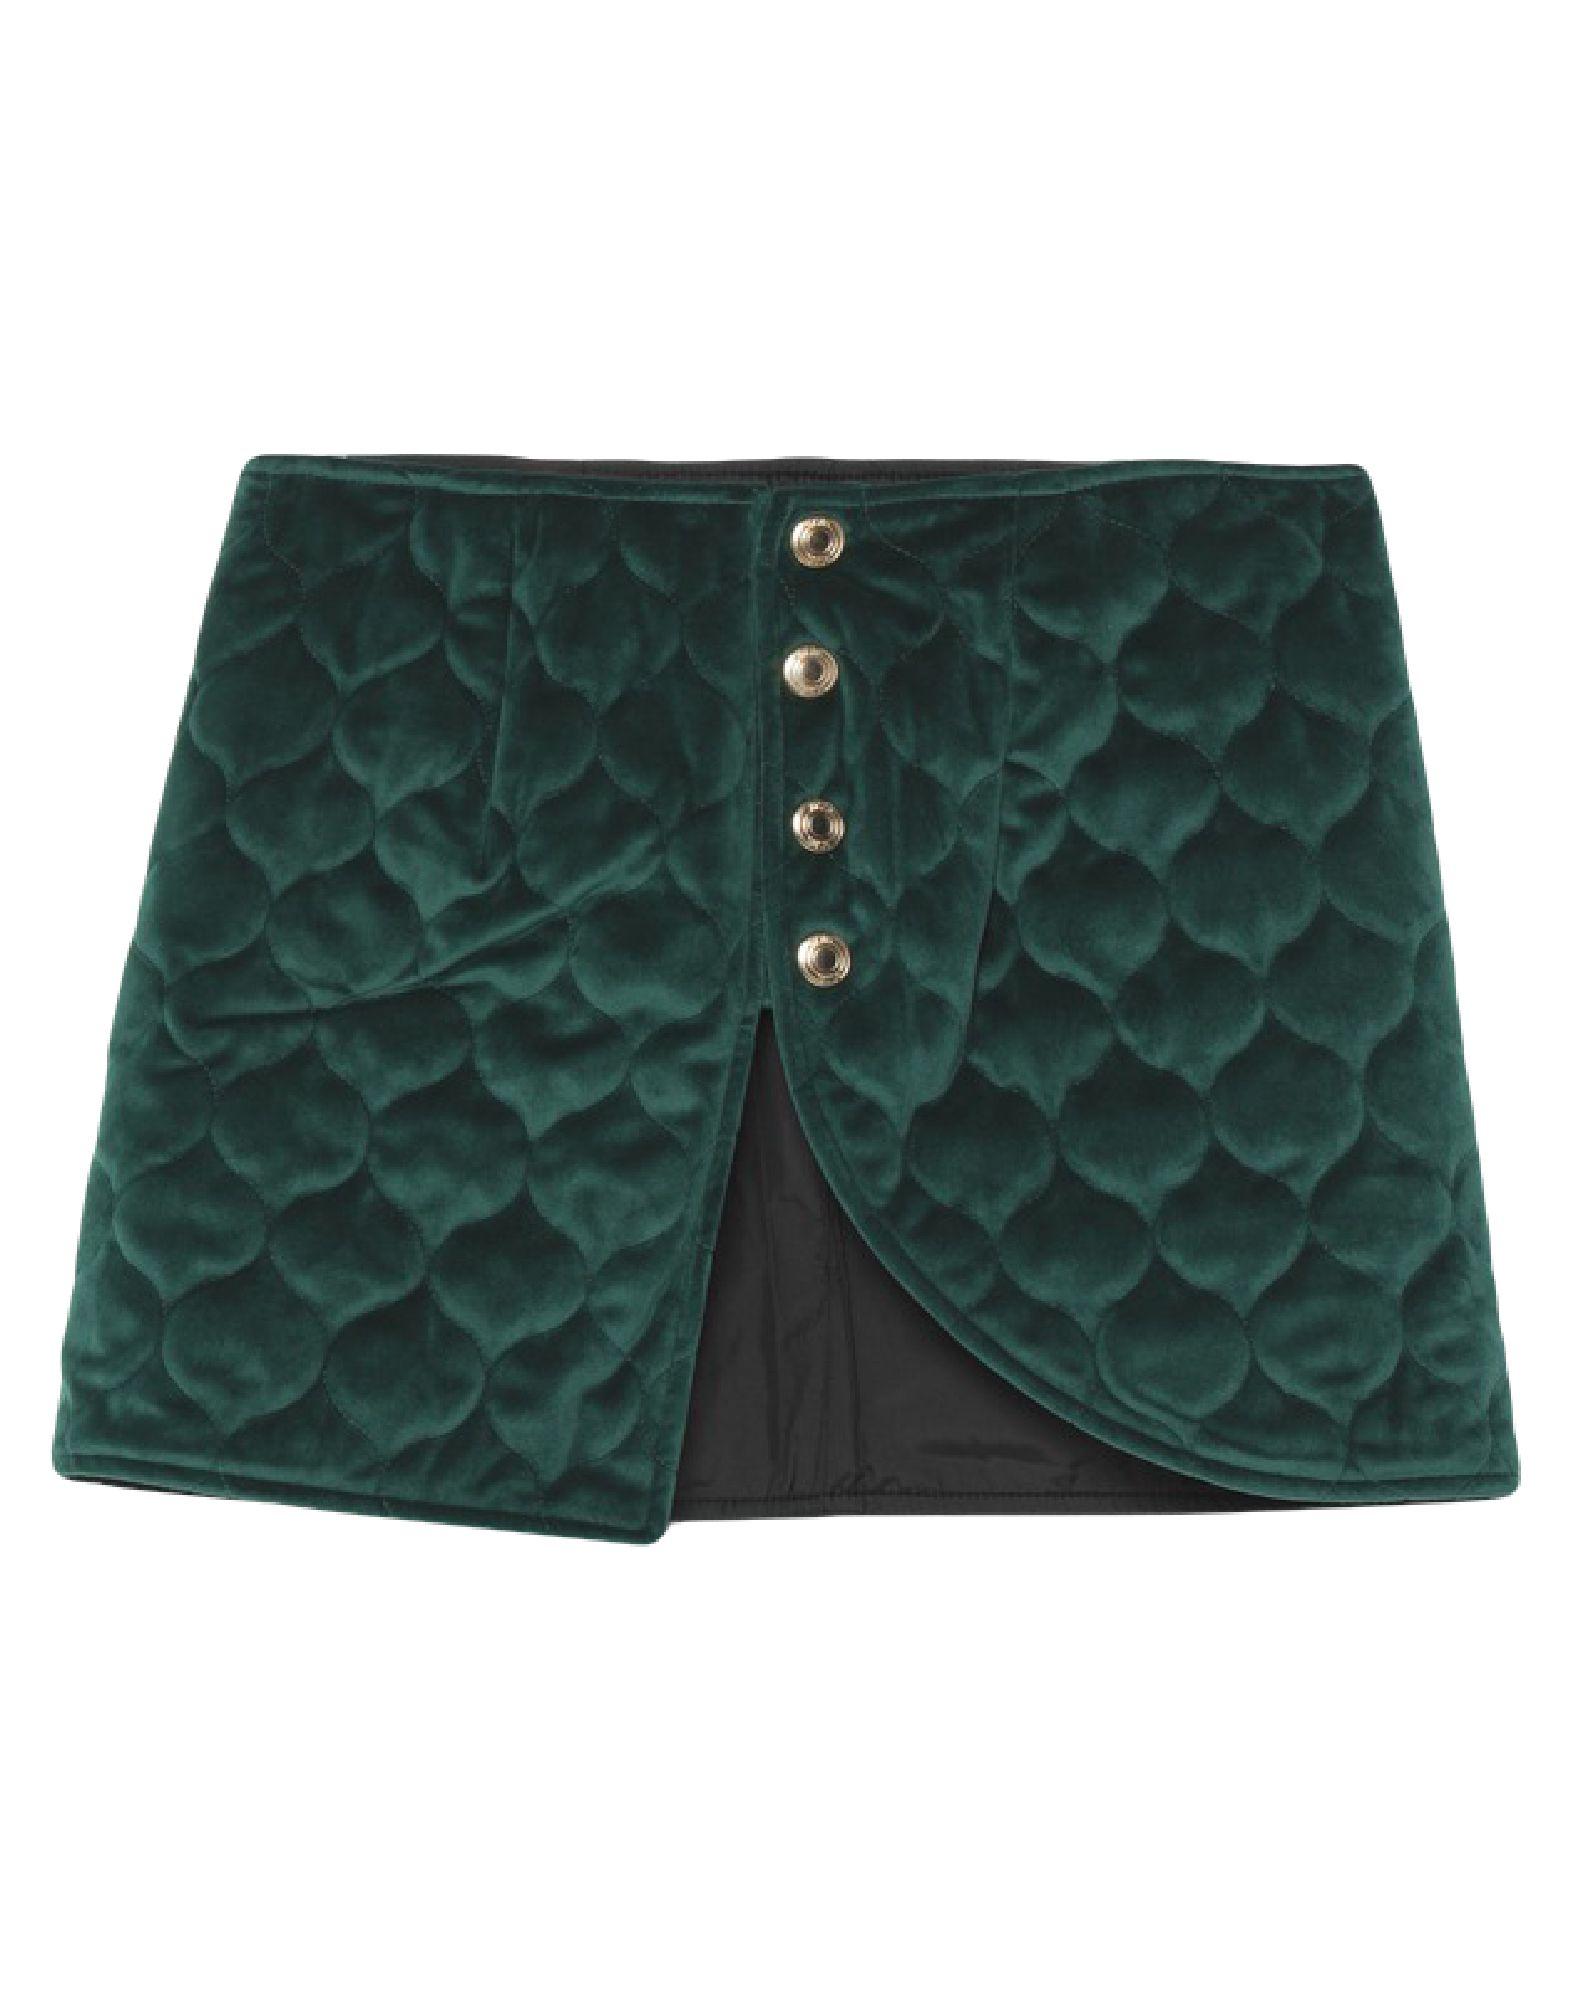 GCDS Mini skirts. velvet, no appliqués, basic solid color, no pockets, side closure, snap buttons fastening, fully lined, side slit. 100% Polyester